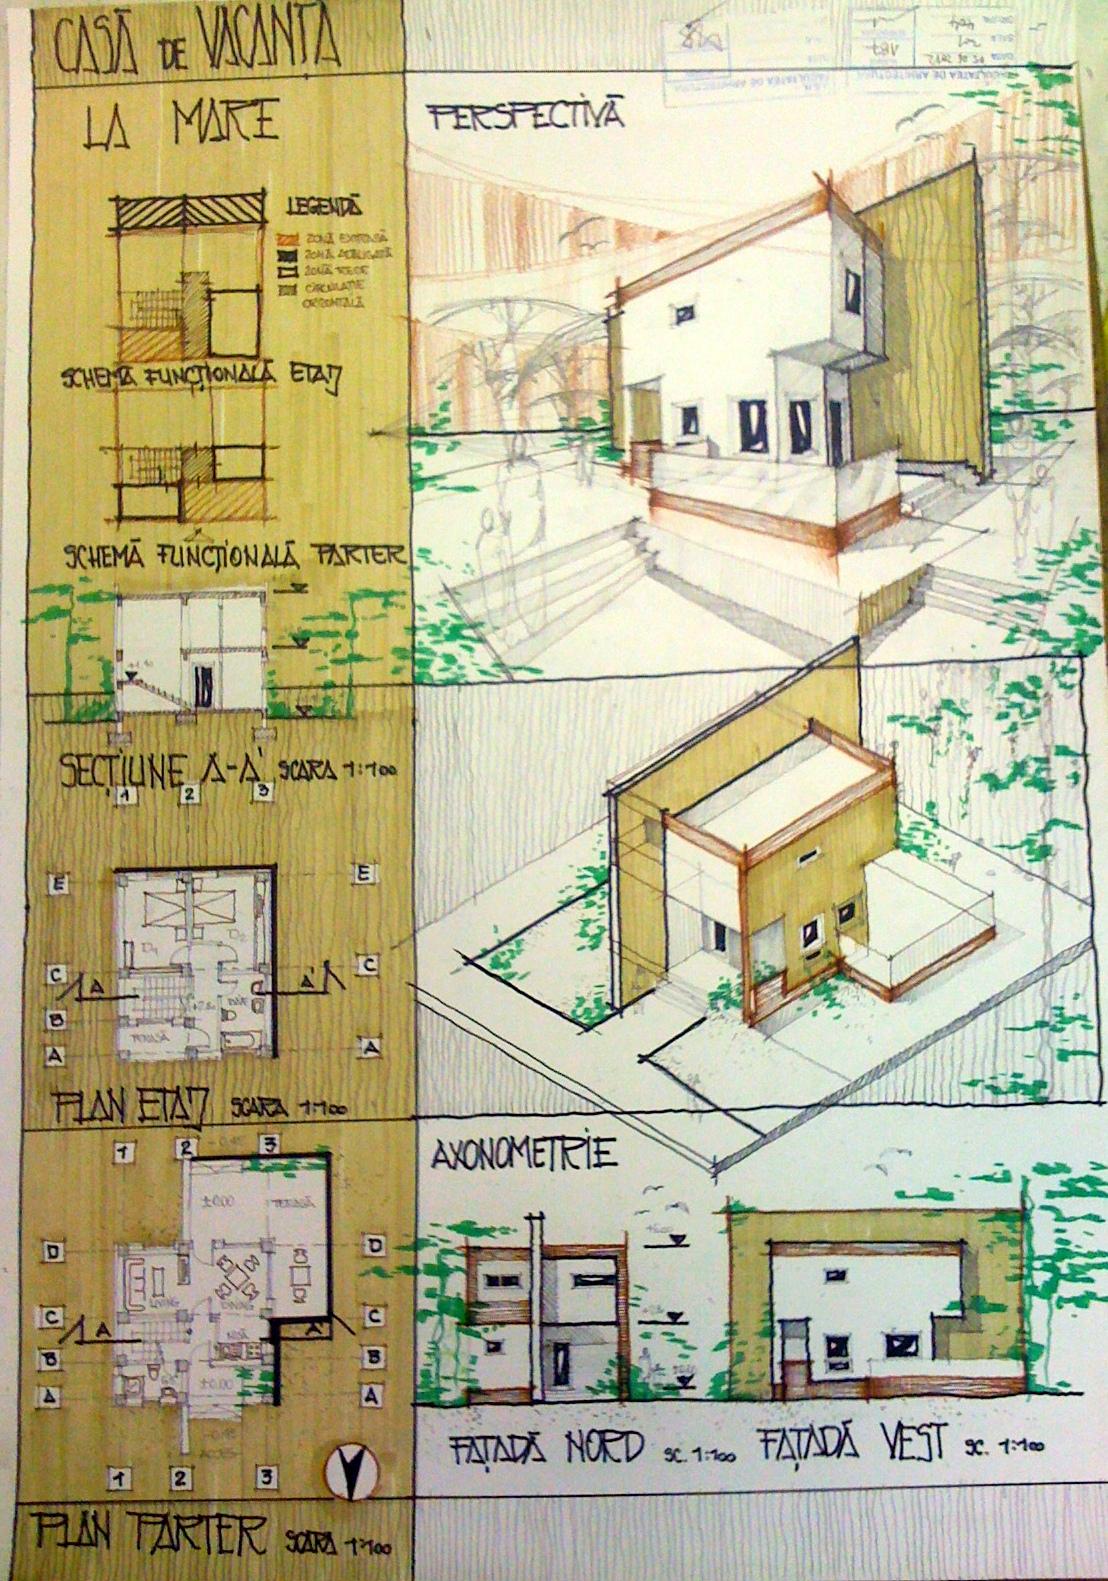 proiect - casa de vacanta la mare